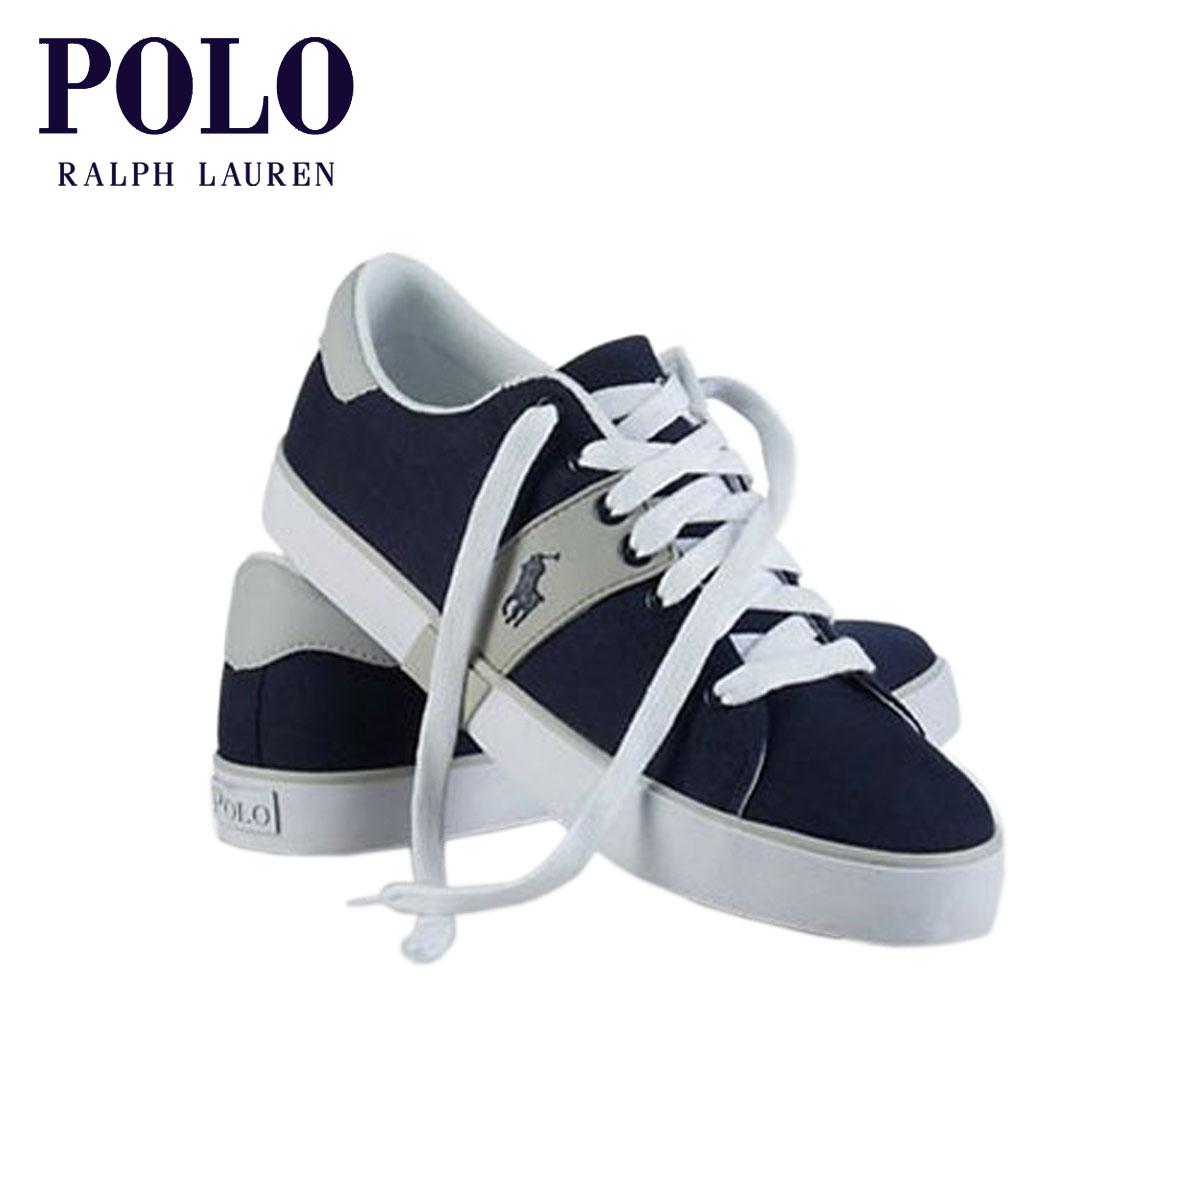 Rakuten Ichiba shop MIXON  Polo Ralph Lauren POLO RALPH LAUREN genuine  campus shoes Burwood Canvas Sneaker Navy 10P13Dec14  244ace7fe